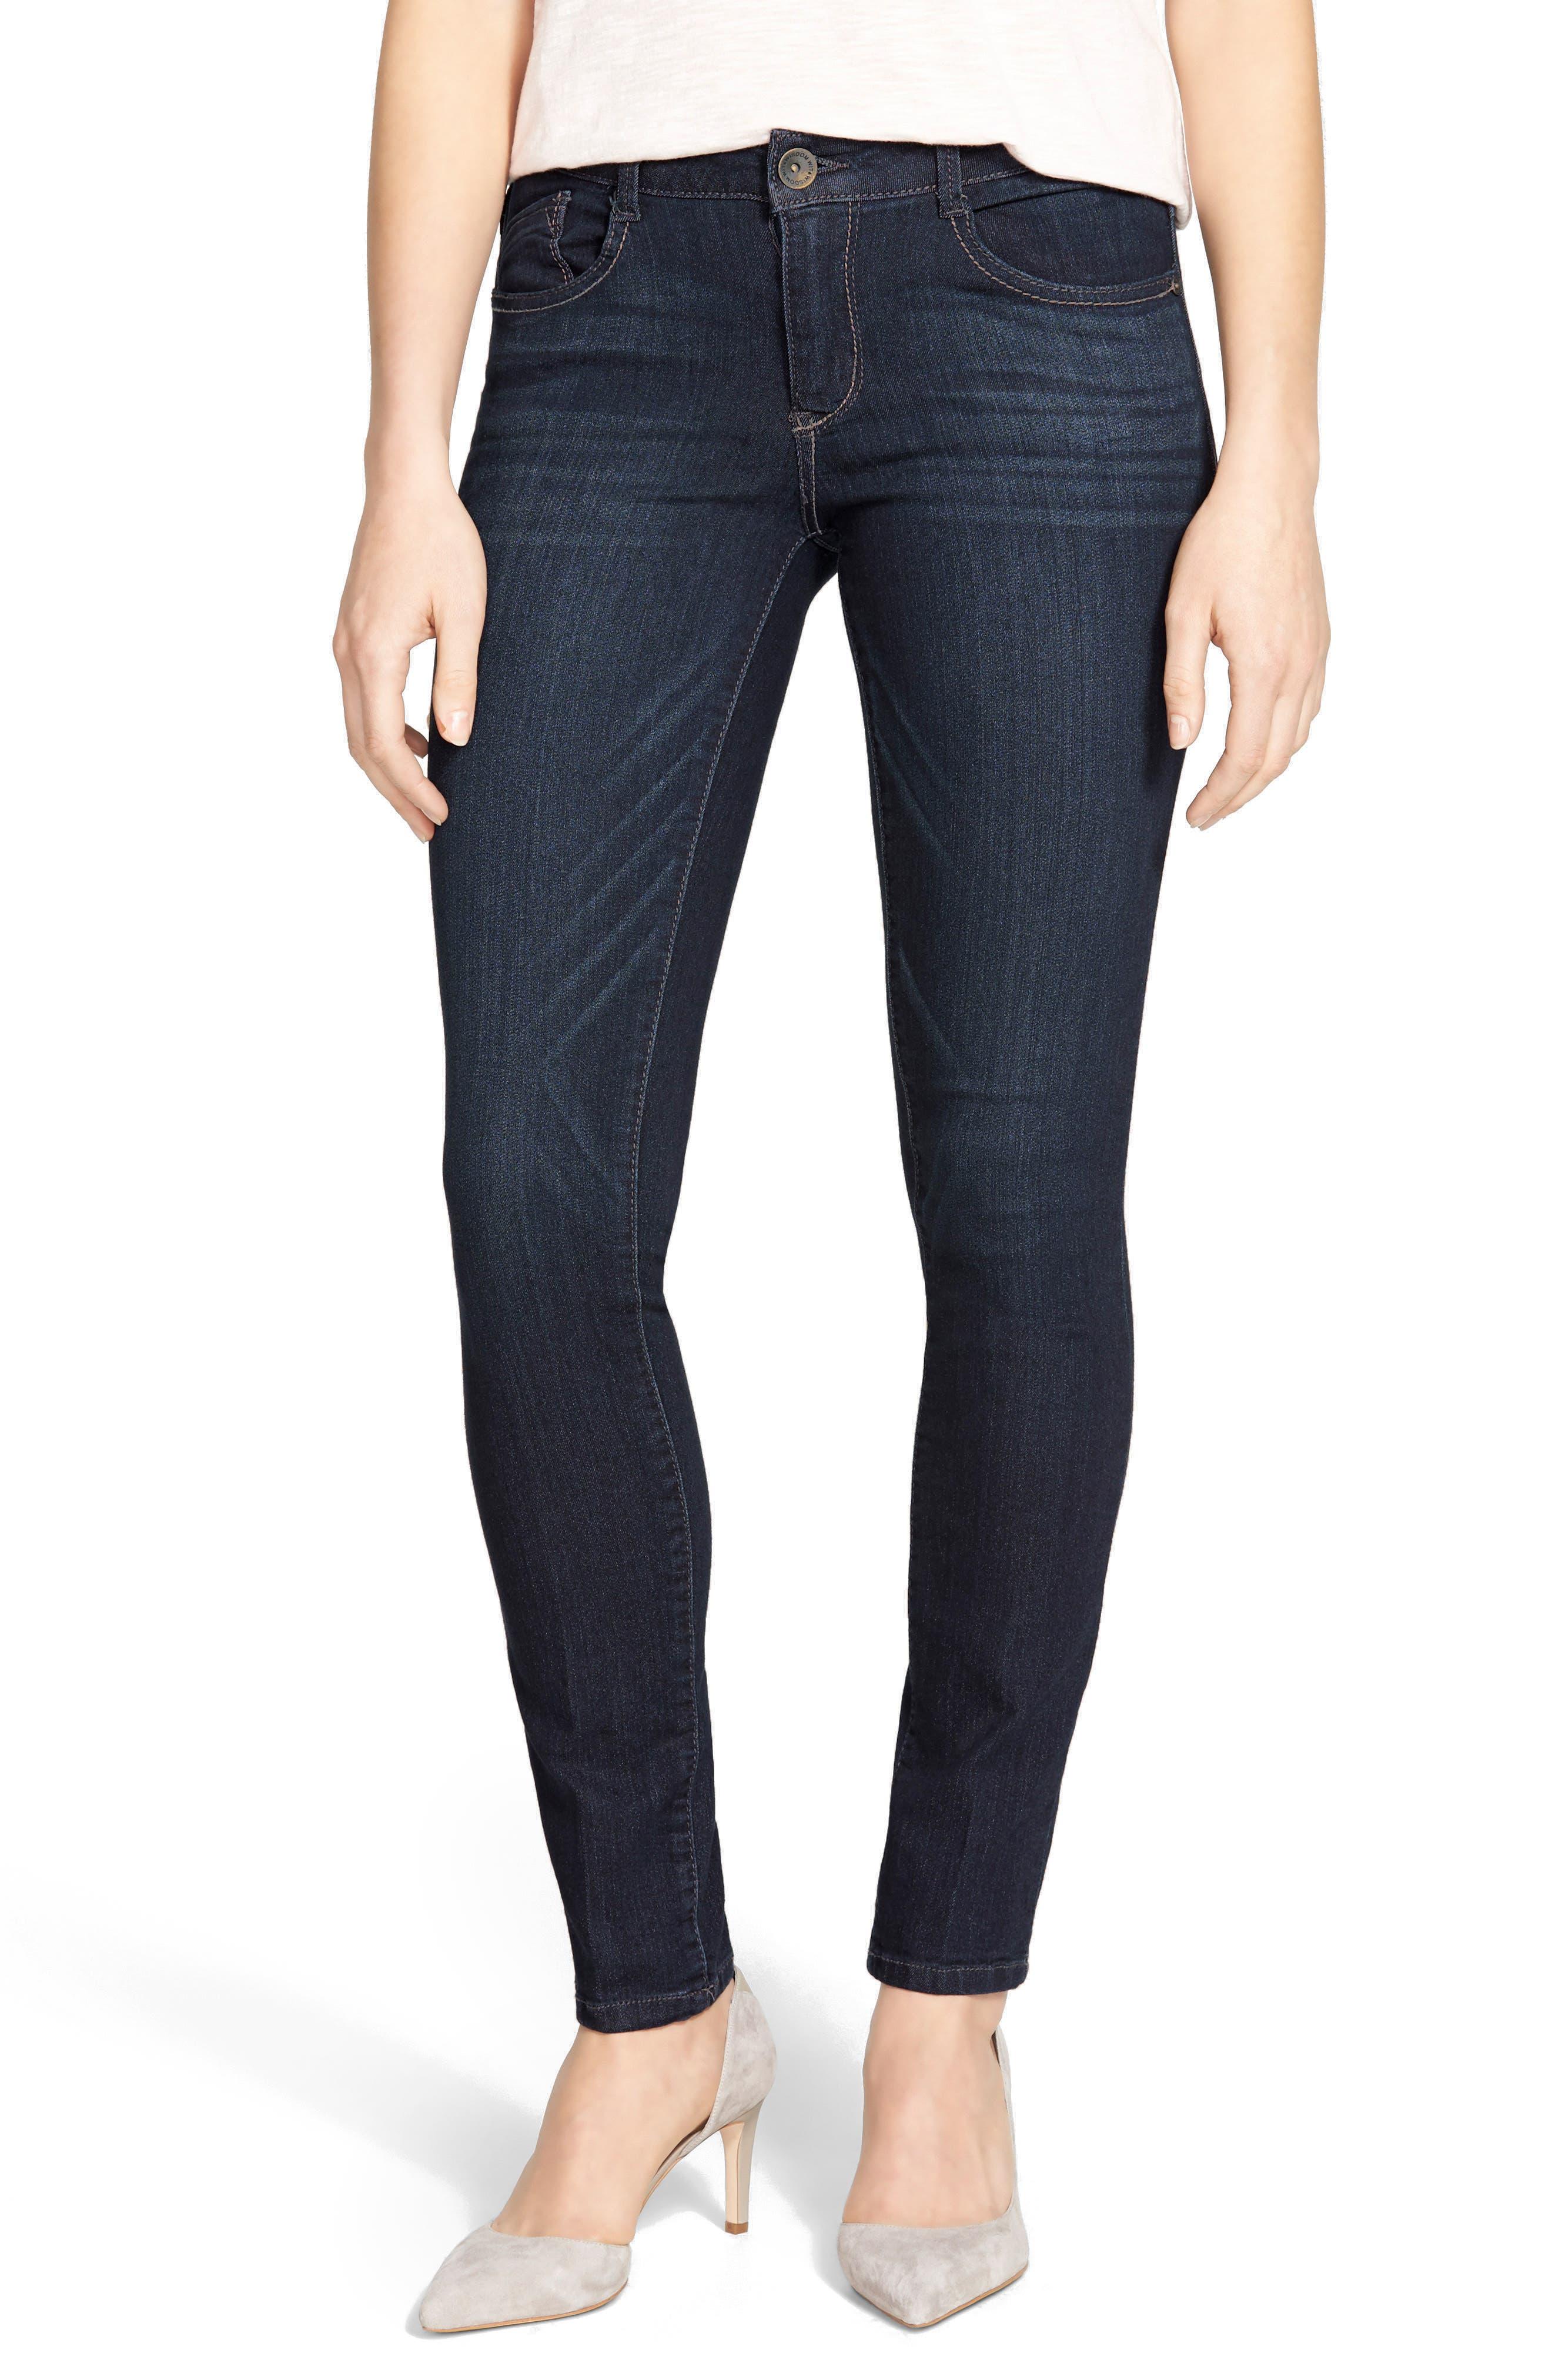 WIT & WISDOM, Super Smooth Stretch Denim Skinny Jeans, Main thumbnail 1, color, DARK NAVY